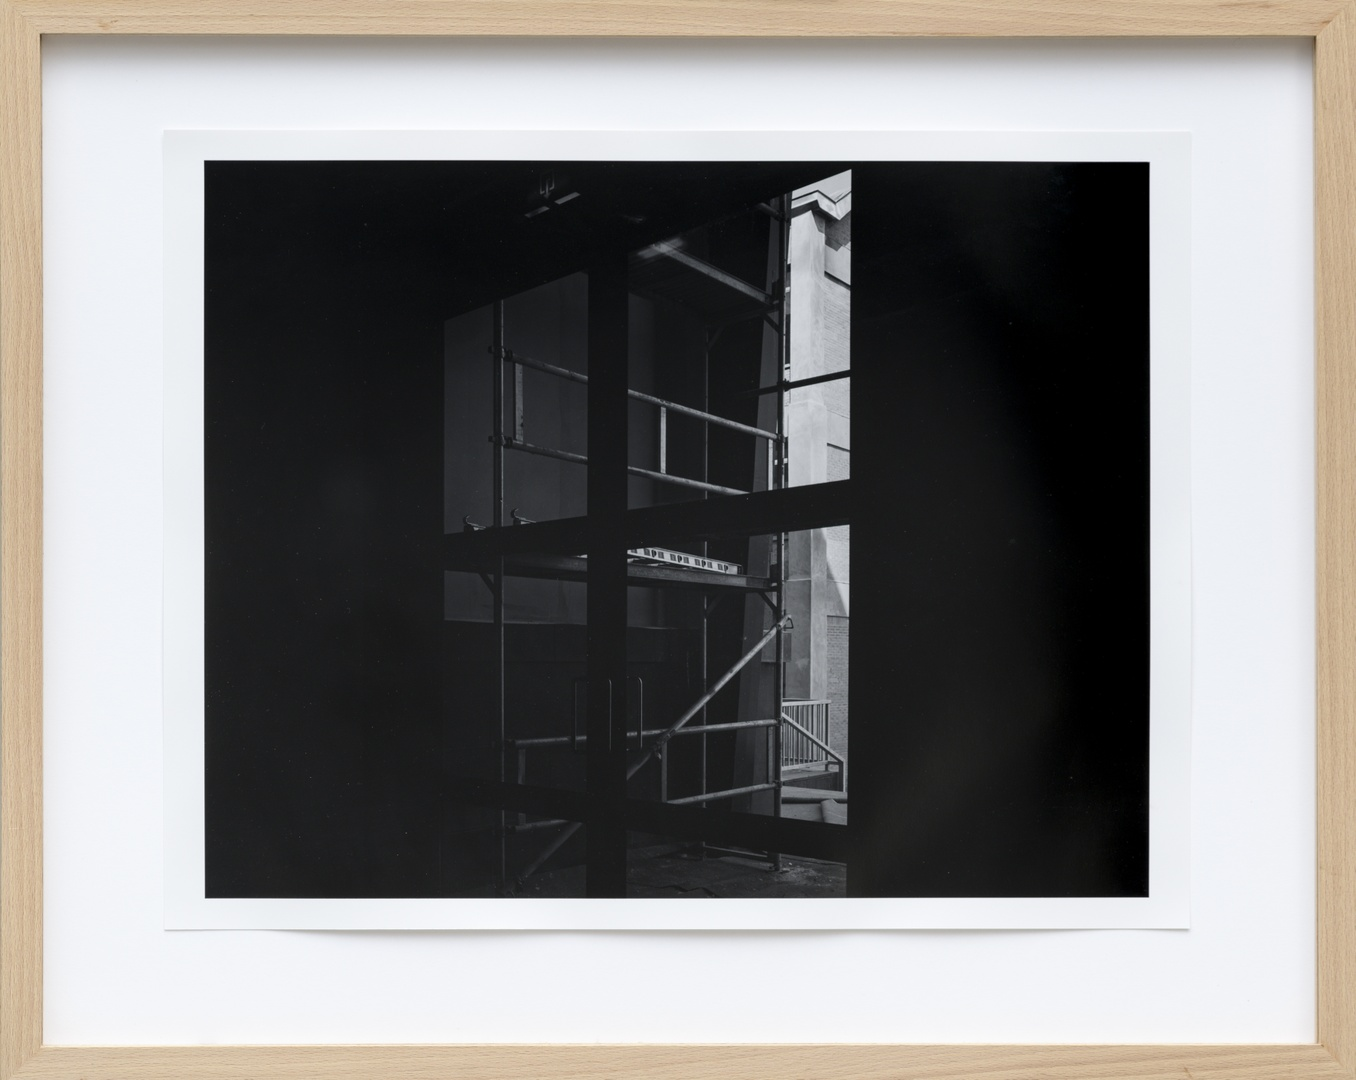 Bouw Bonnefantenmuseum 1992-1994 ; Opbouw basement zuidgevel